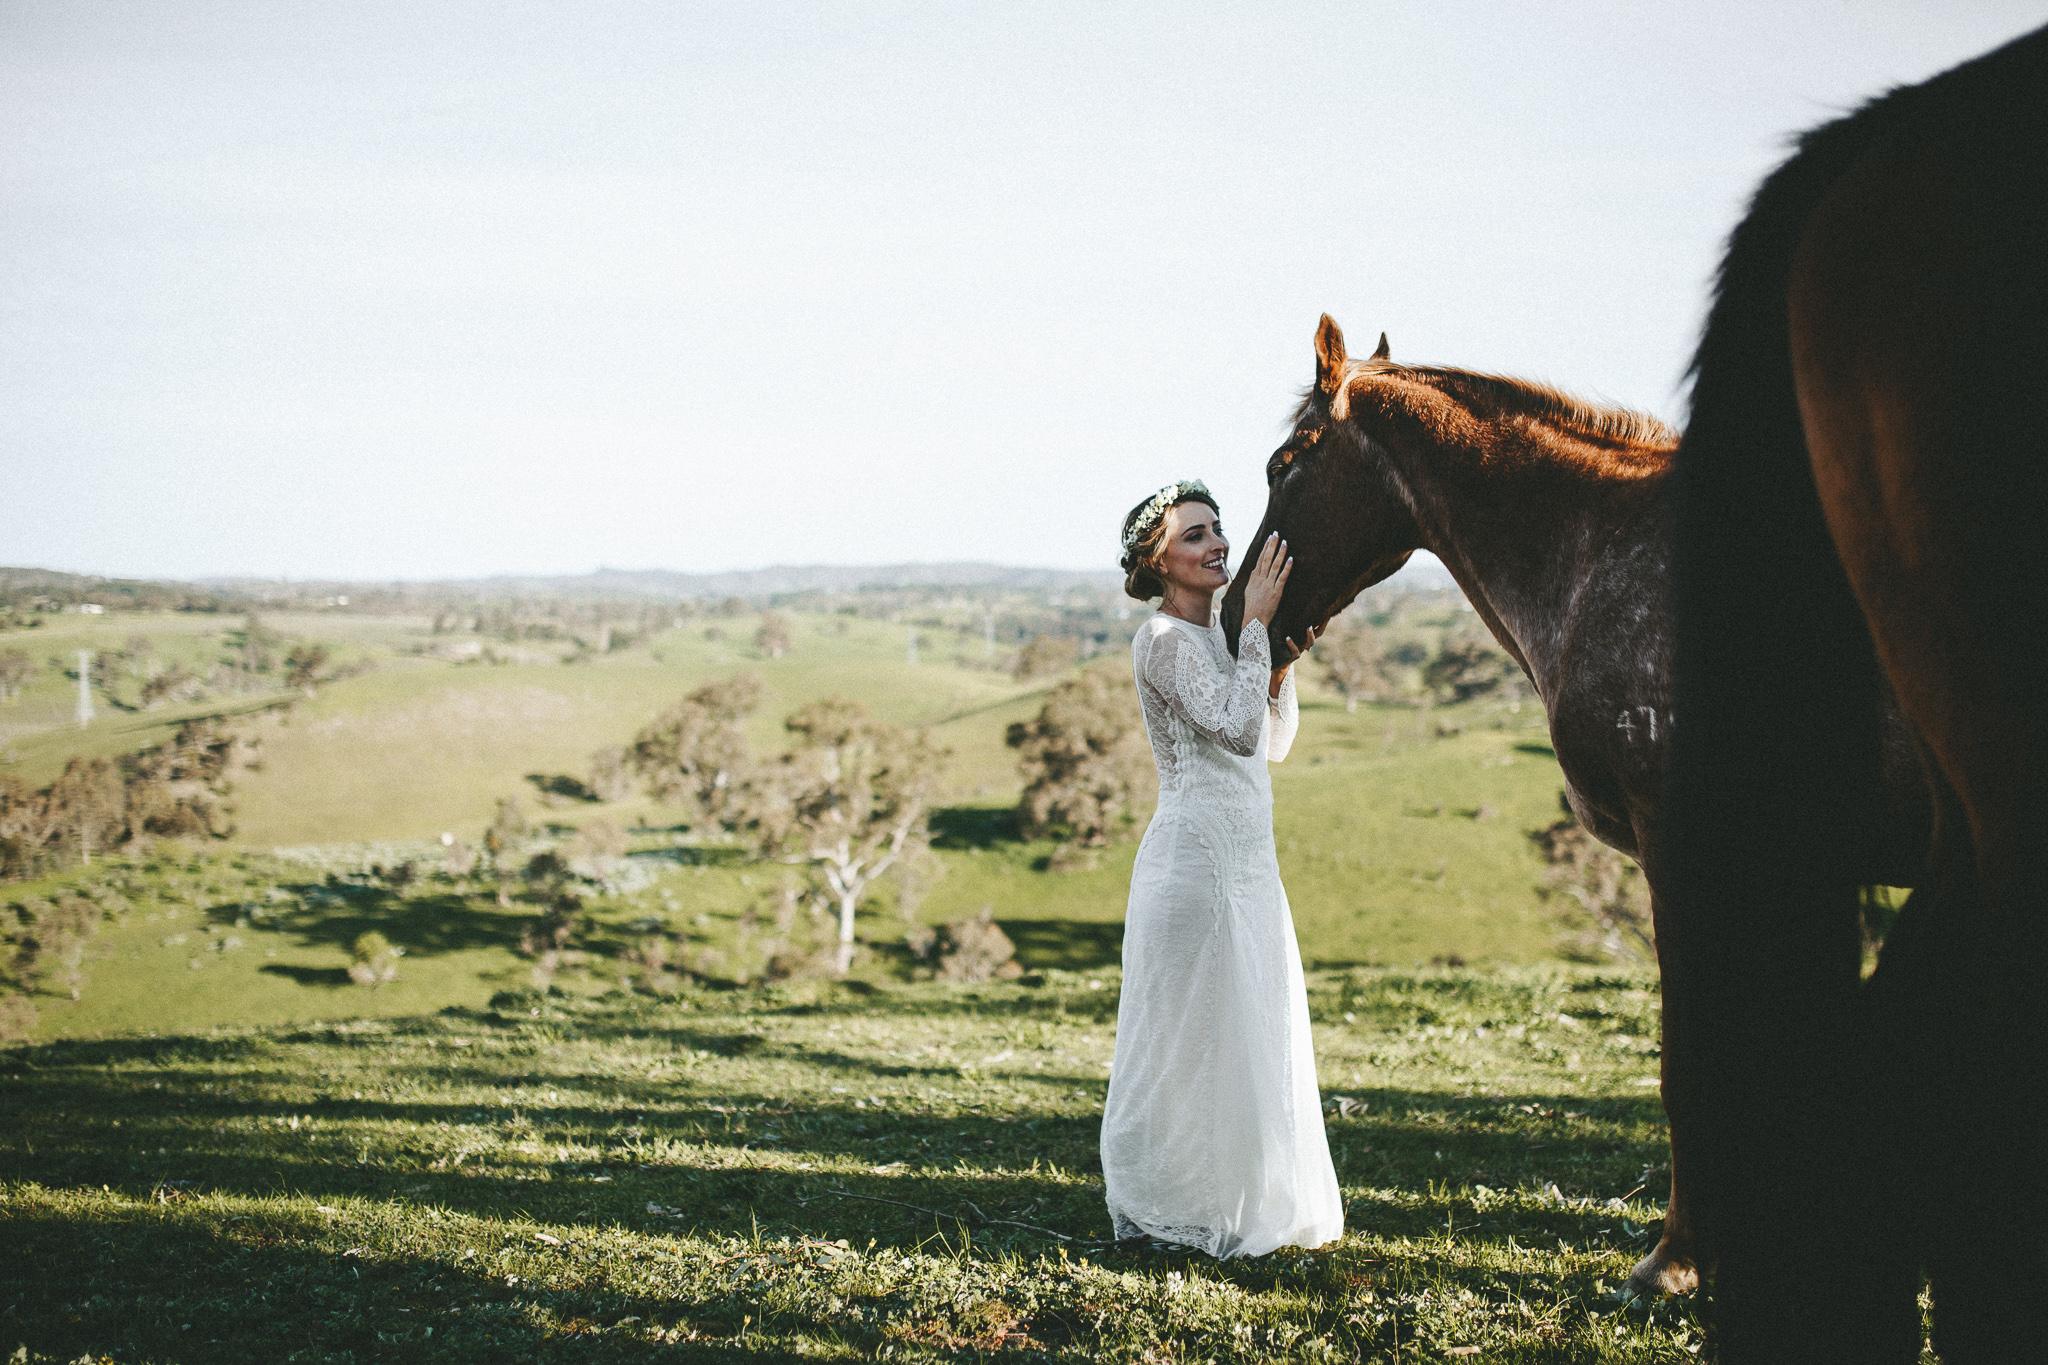 christopher morrison_adelaide hills wedding_ andy + teegan_55_9882.jpg